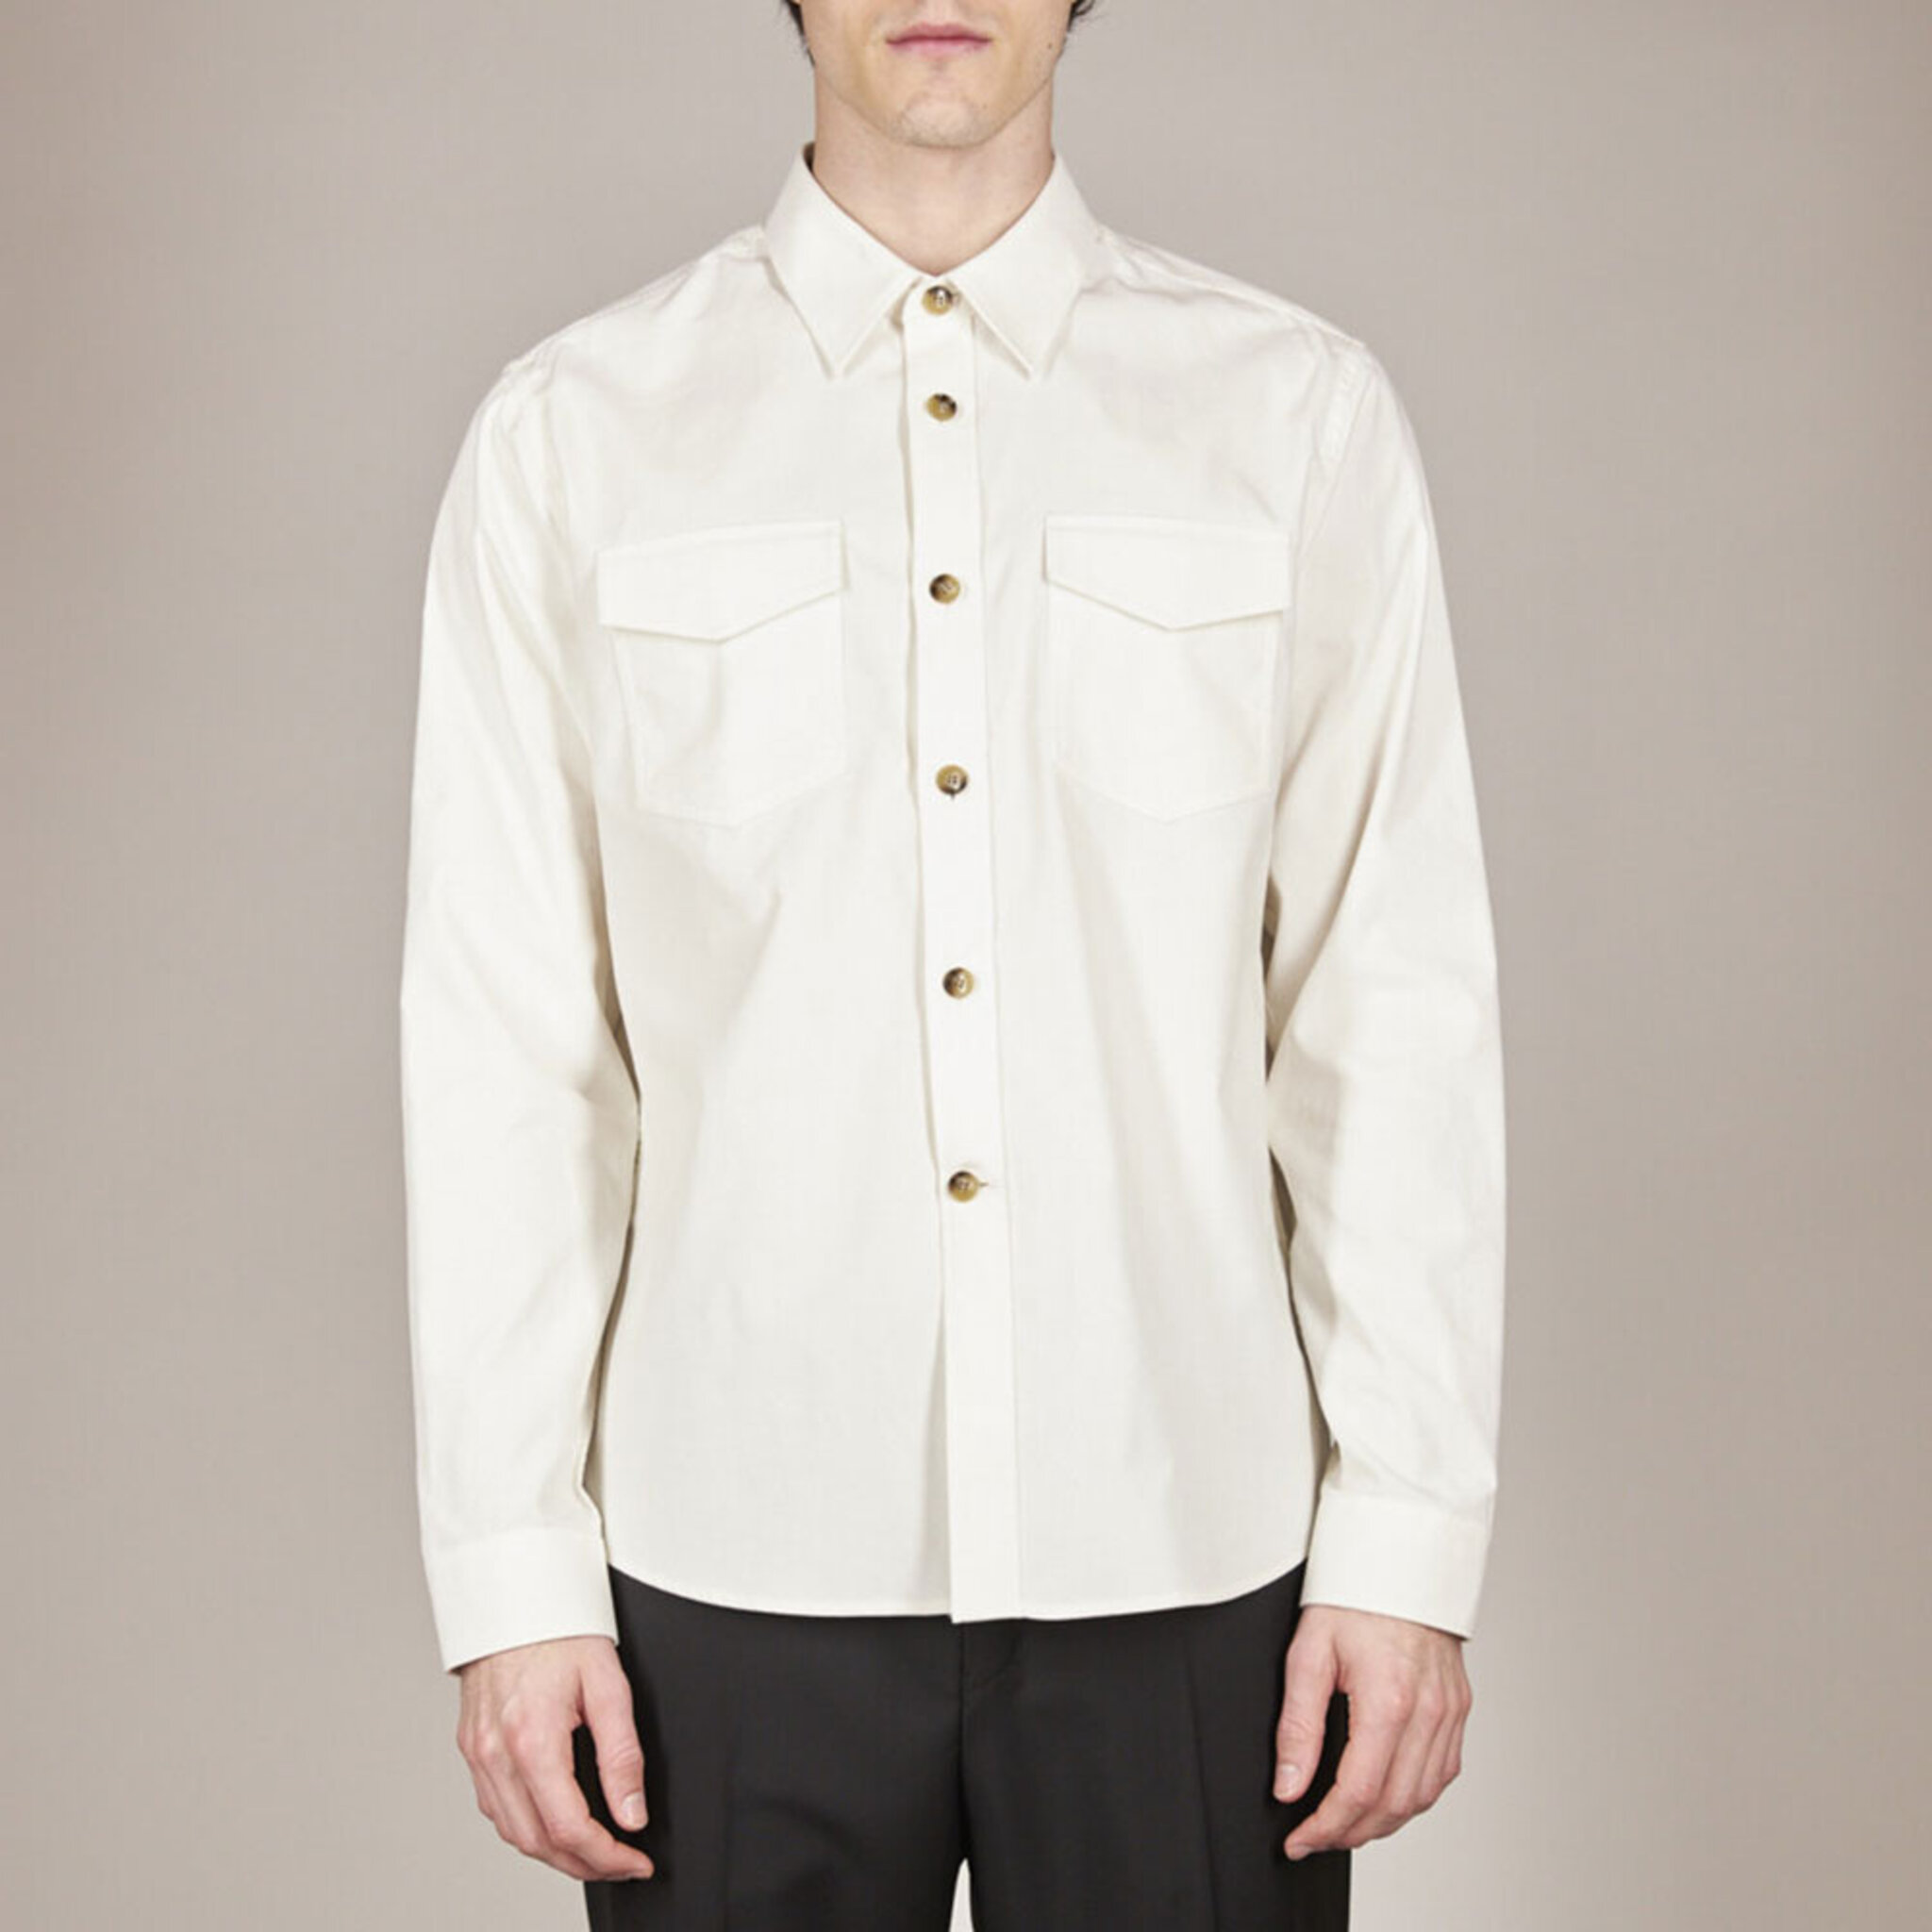 Arnou Shirt